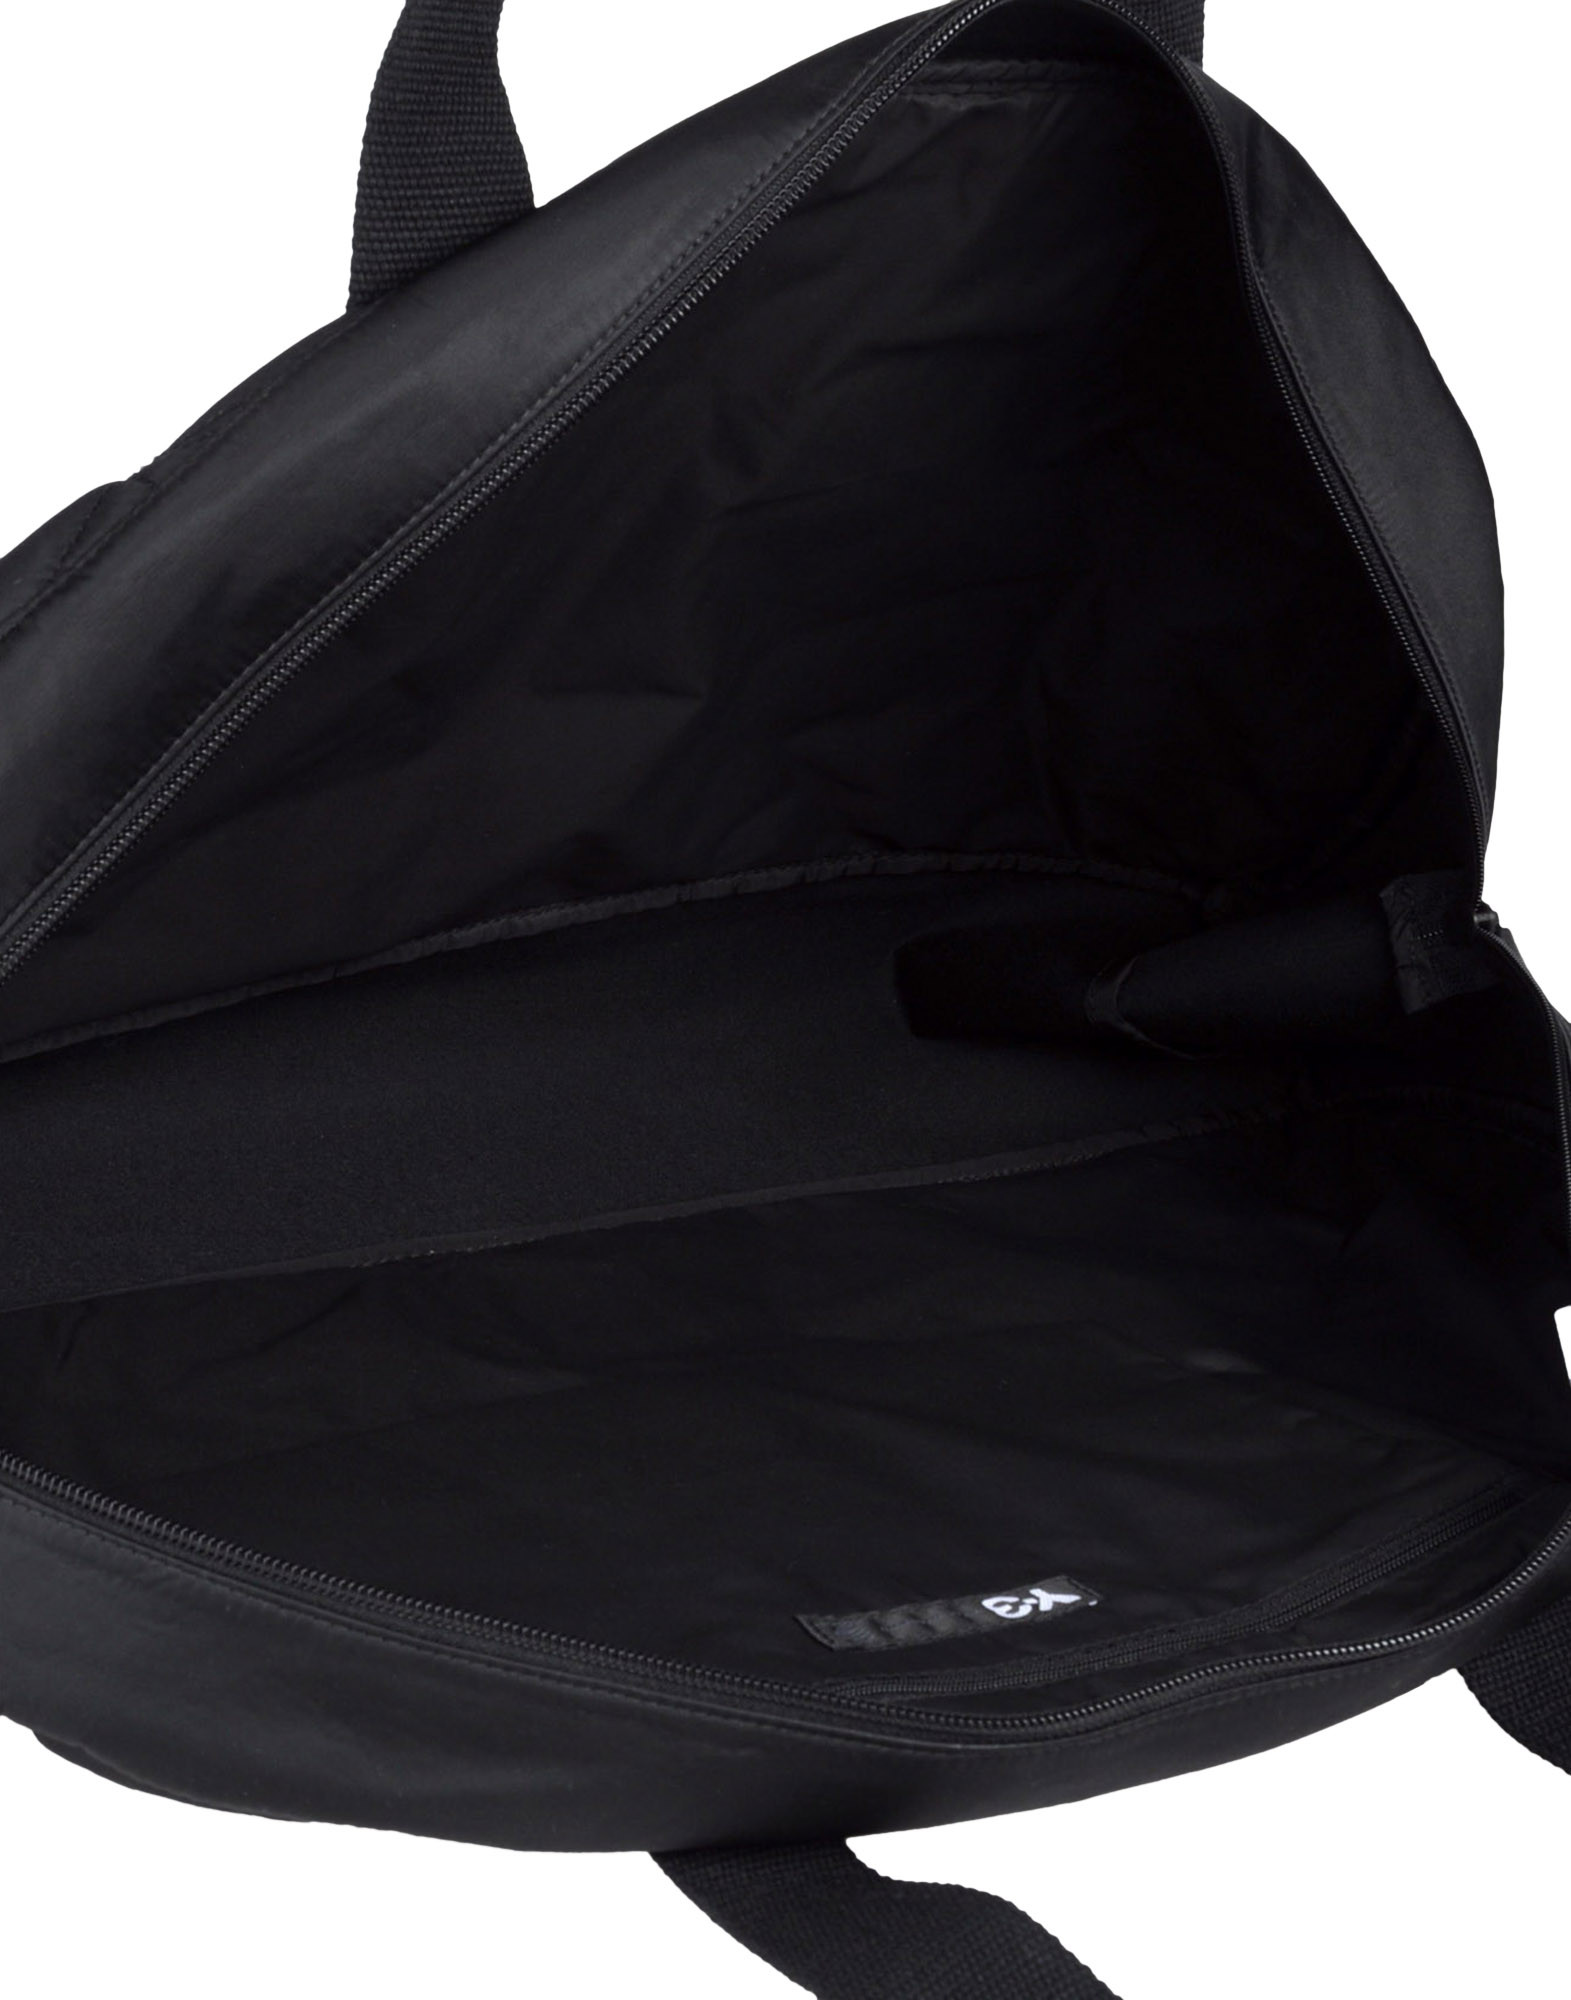 Y-3 Y-3 Toile Line Duffel Bag Large fabric bag Woman e ... 542e18ecab879